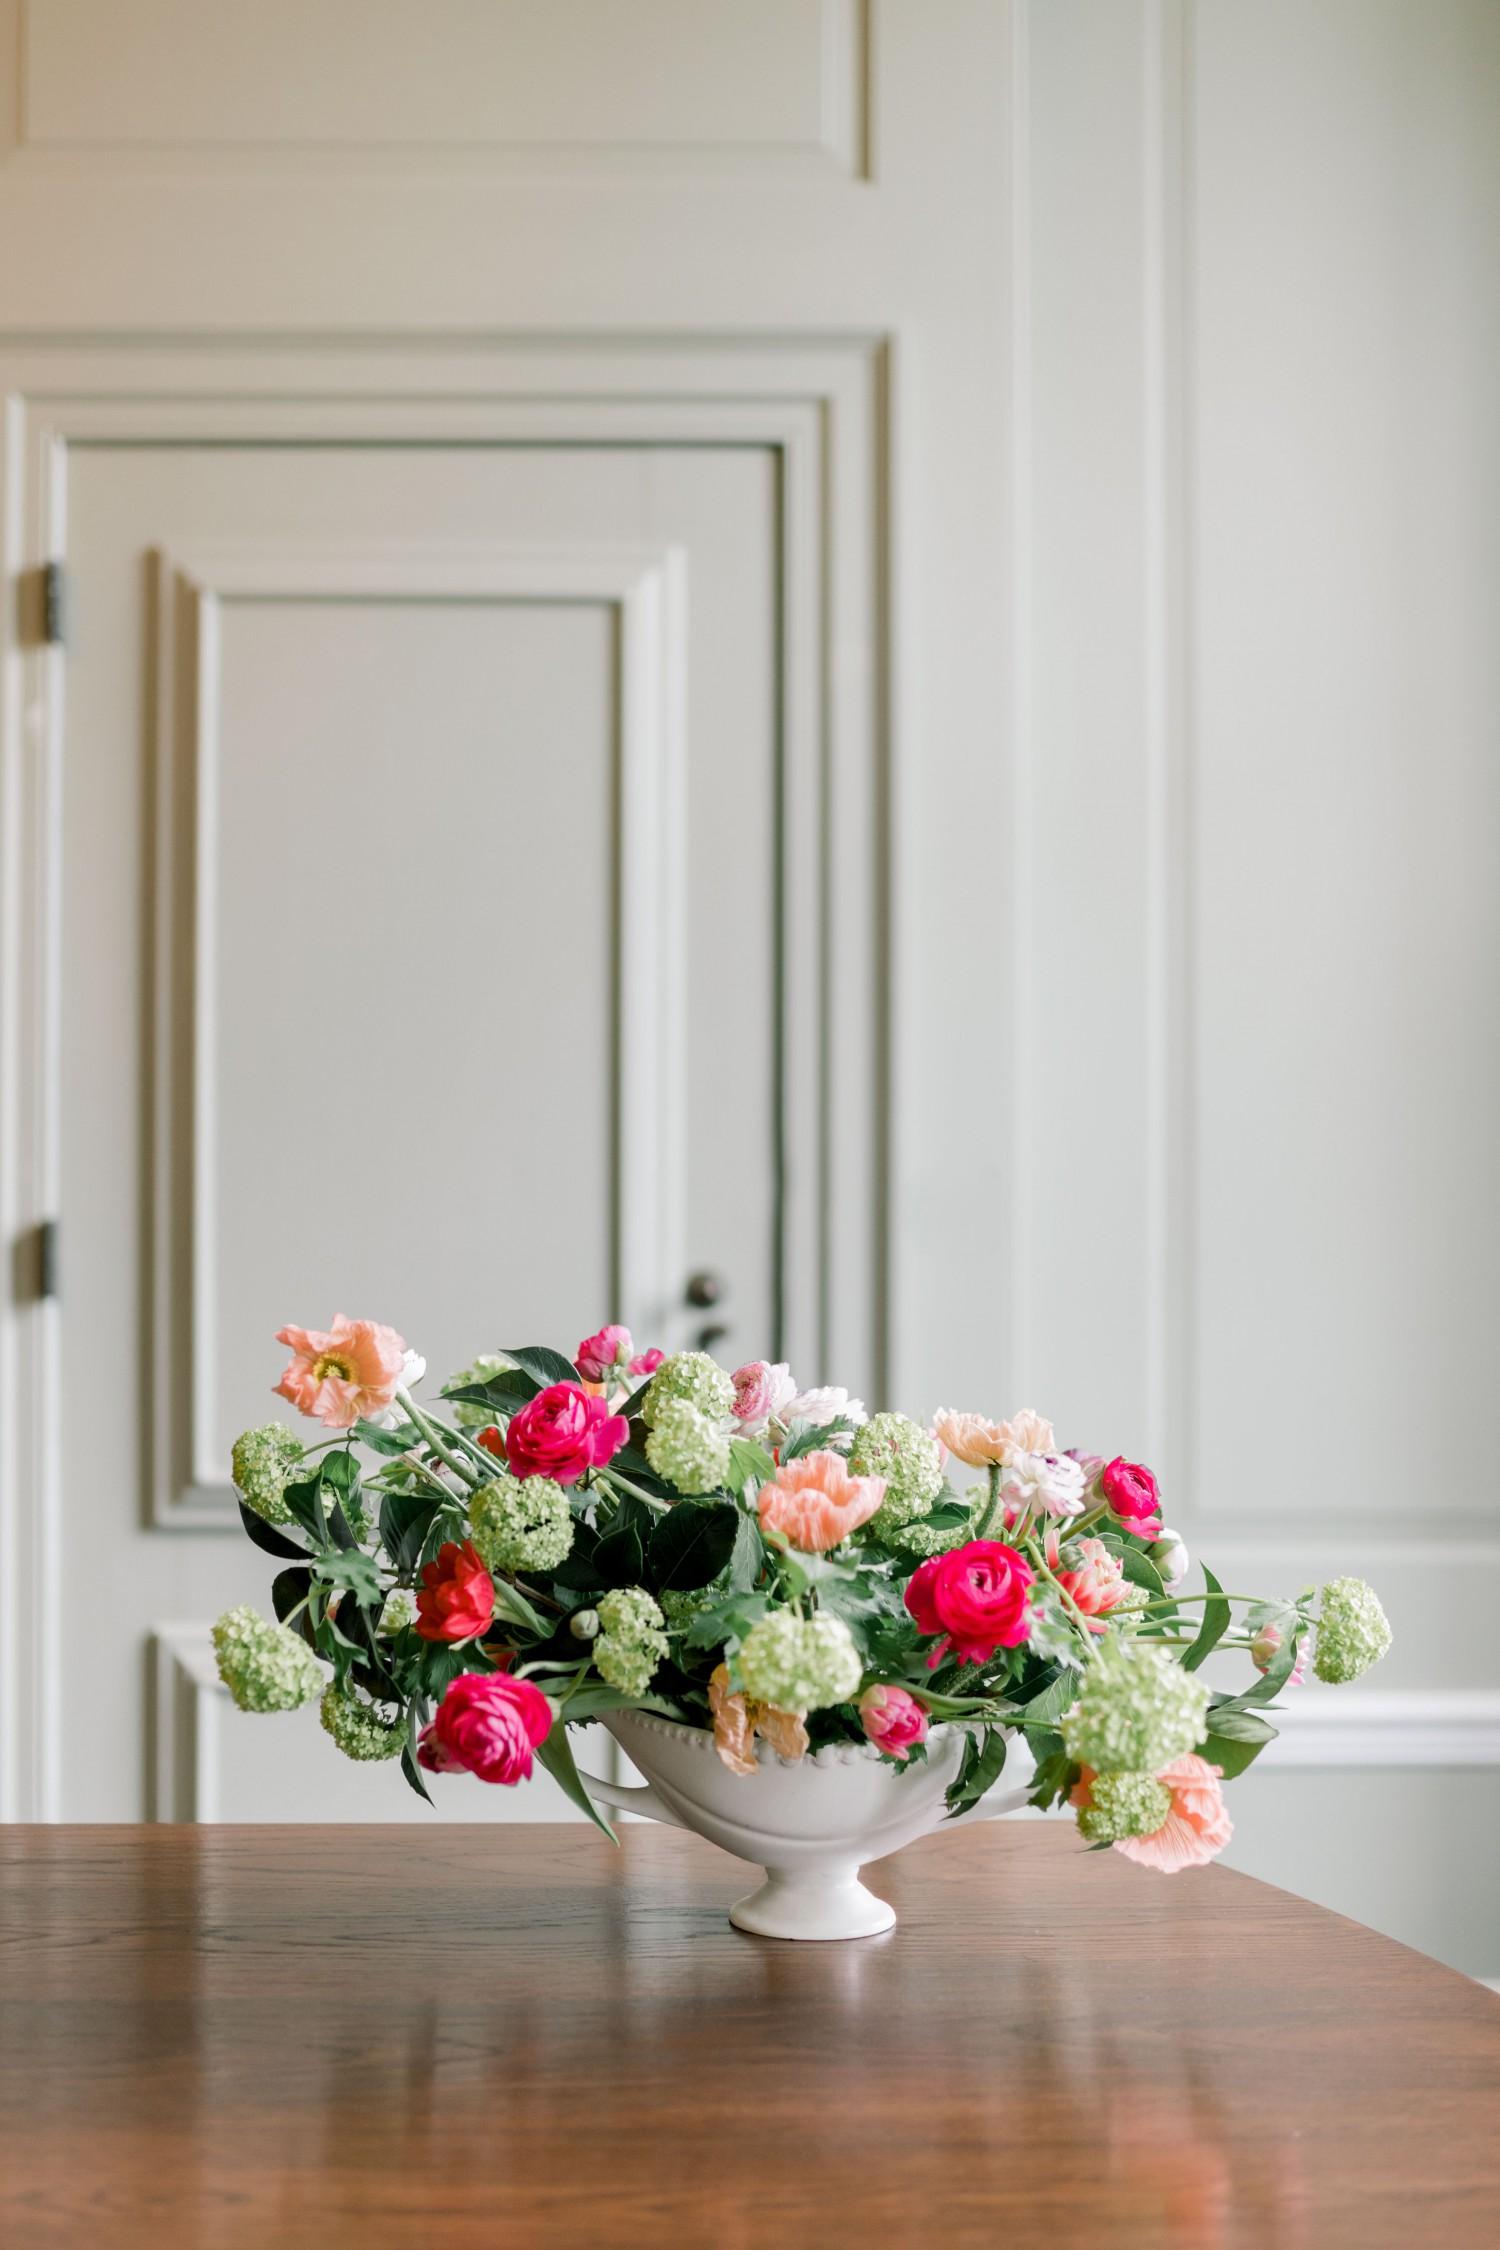 Littleton-Rose-Wedding-Planner-Oxfordshire-Thorpe-Manor-International-Women's-Day-Flowers-2.jpg